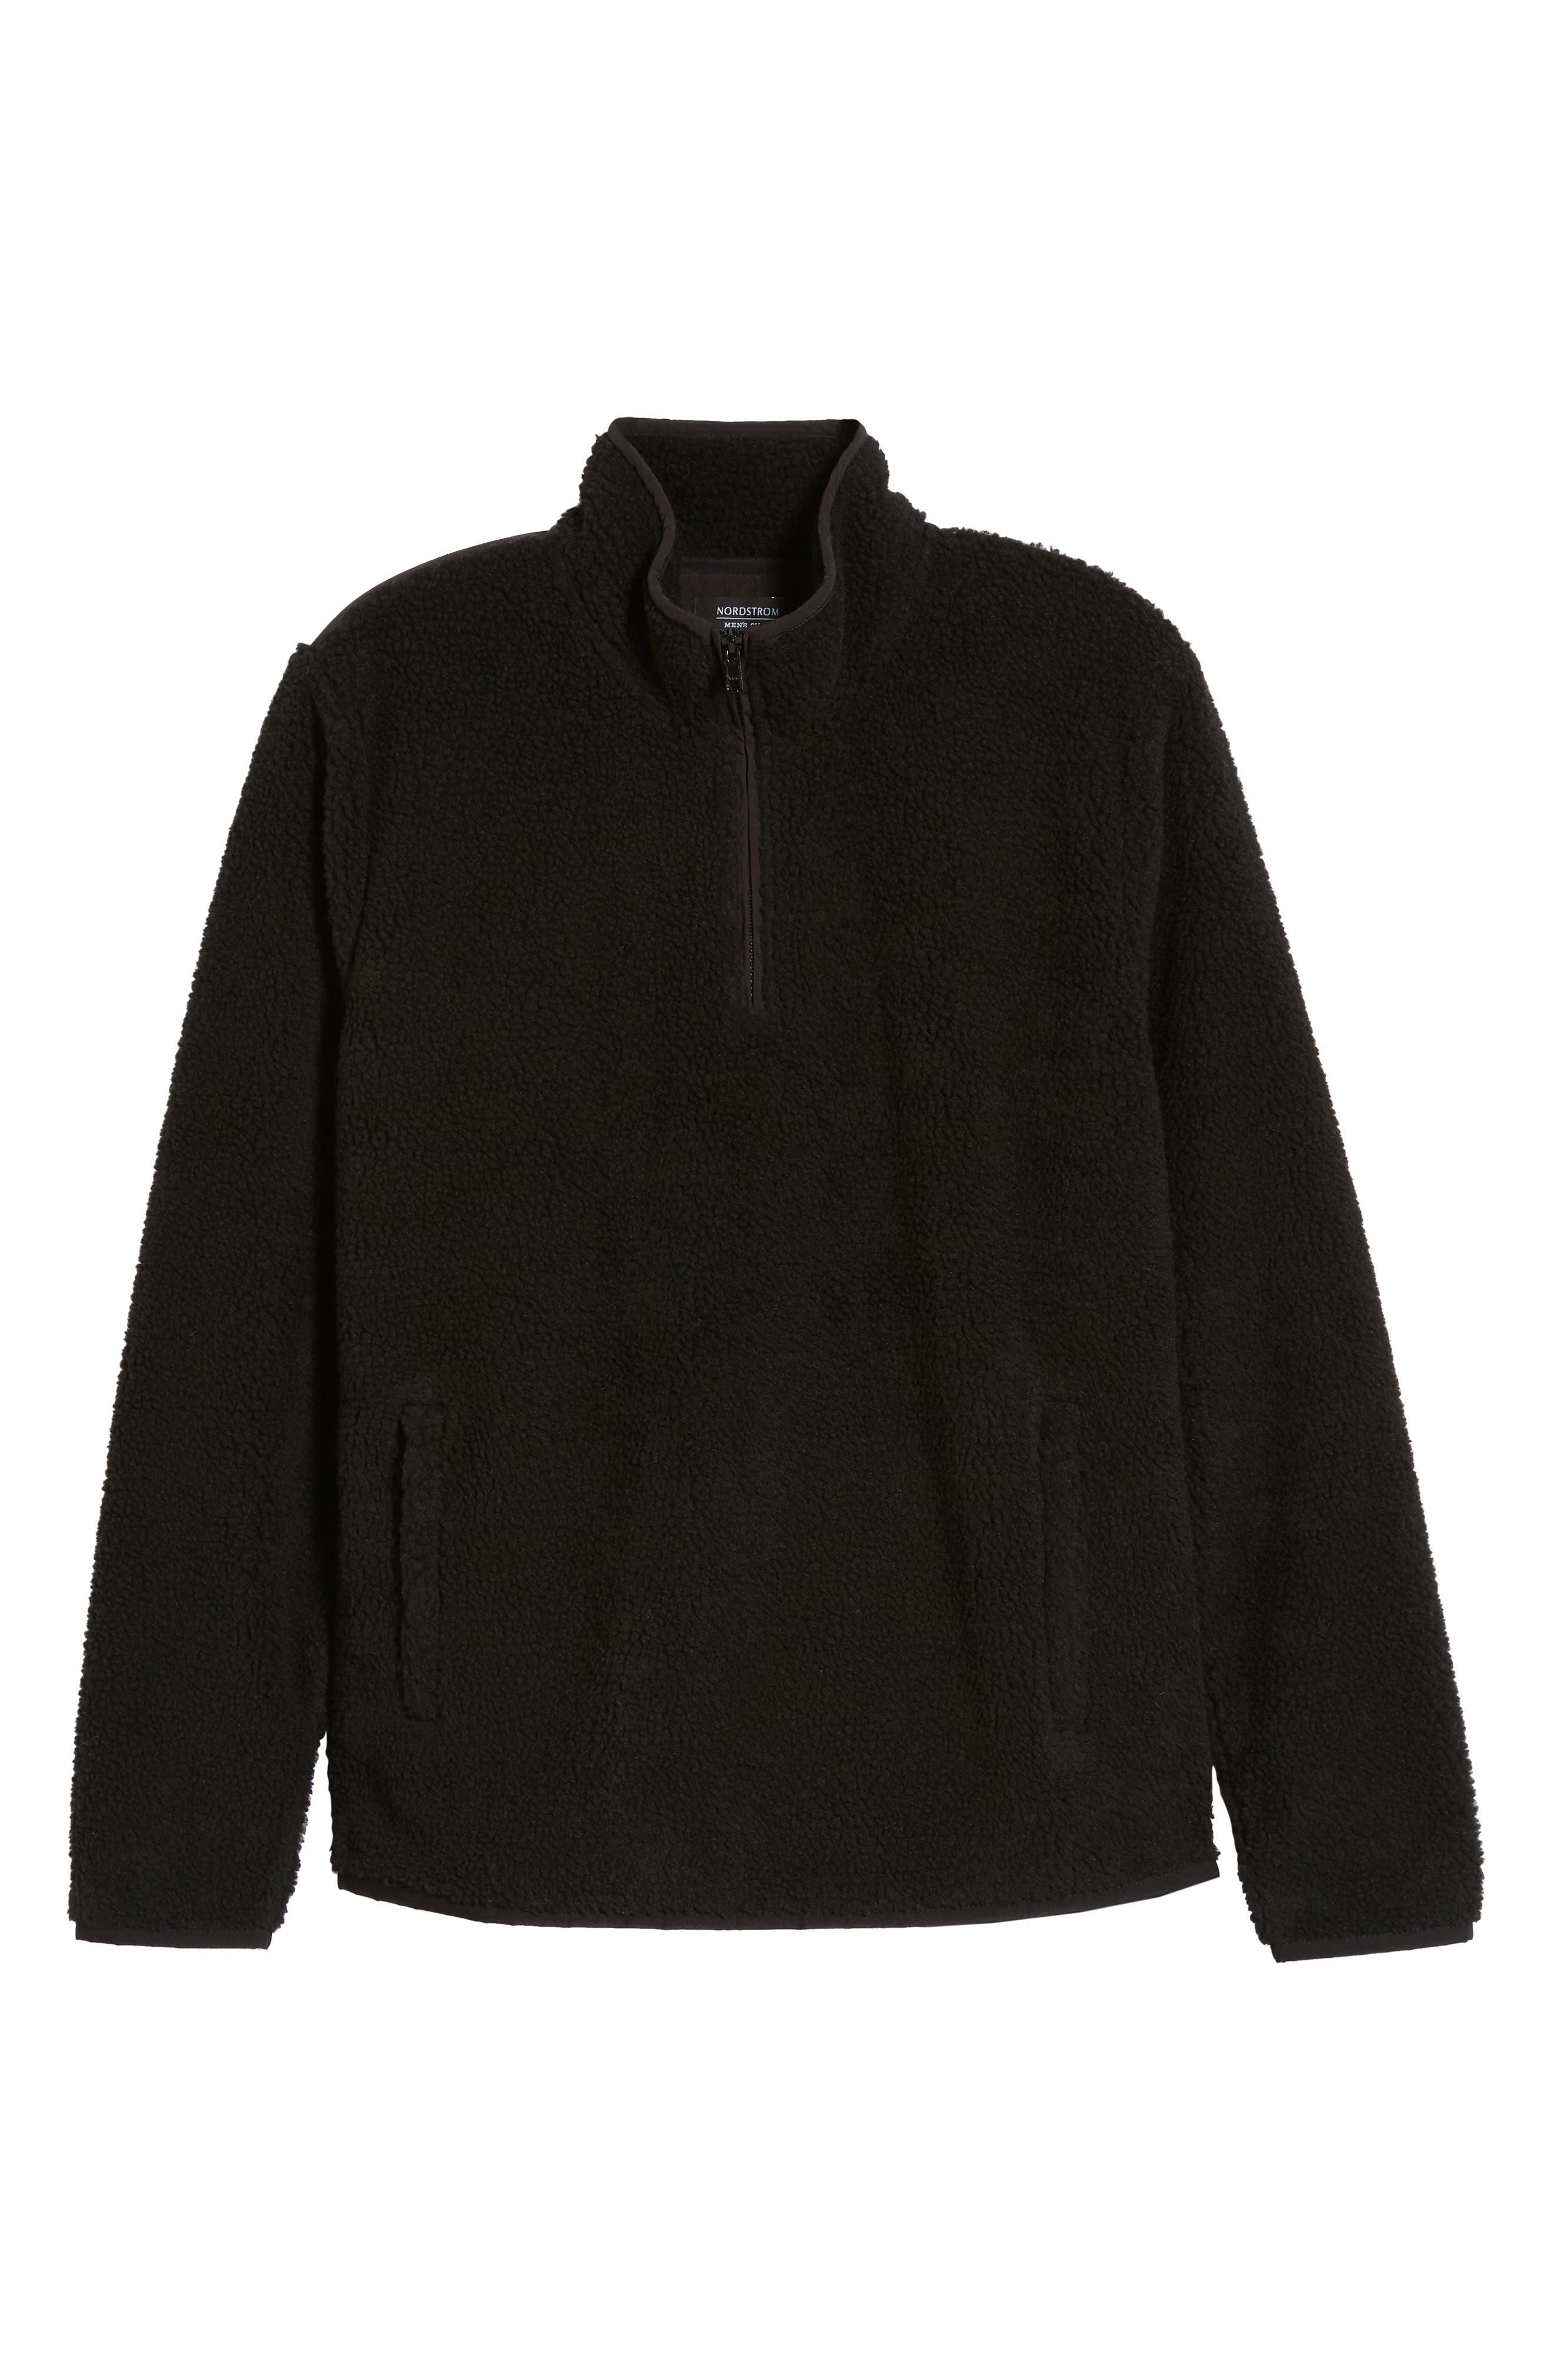 Quarter Zip Fleece Pullover,                             Alternate thumbnail 7, color,                             BLACK CAVIAR